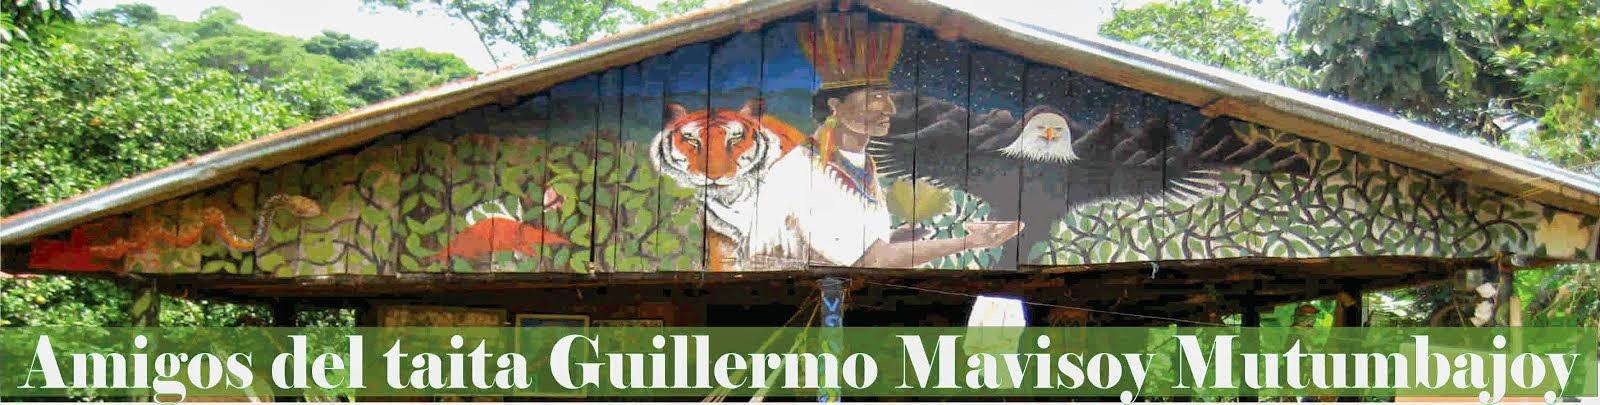 Amigos del Taita Guillermo Mavisoy Mutumbajoy